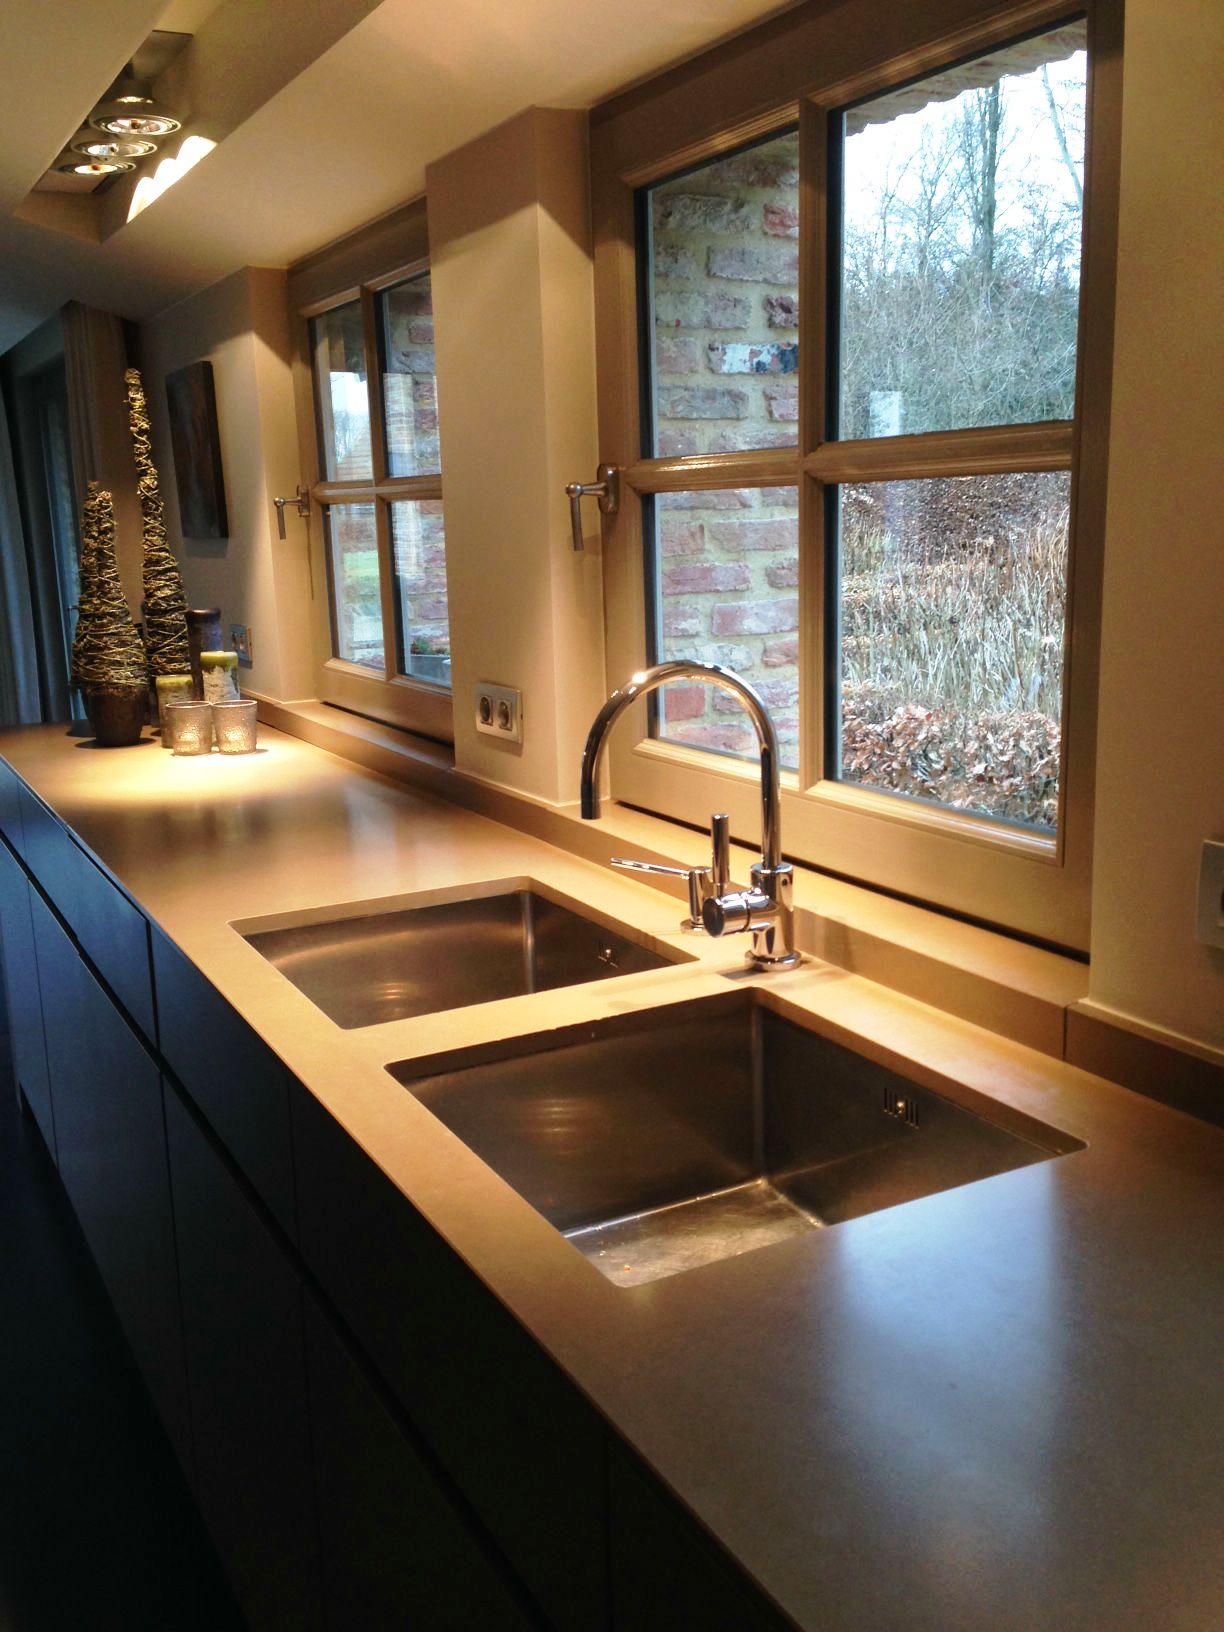 interieur keuken te Herenthout